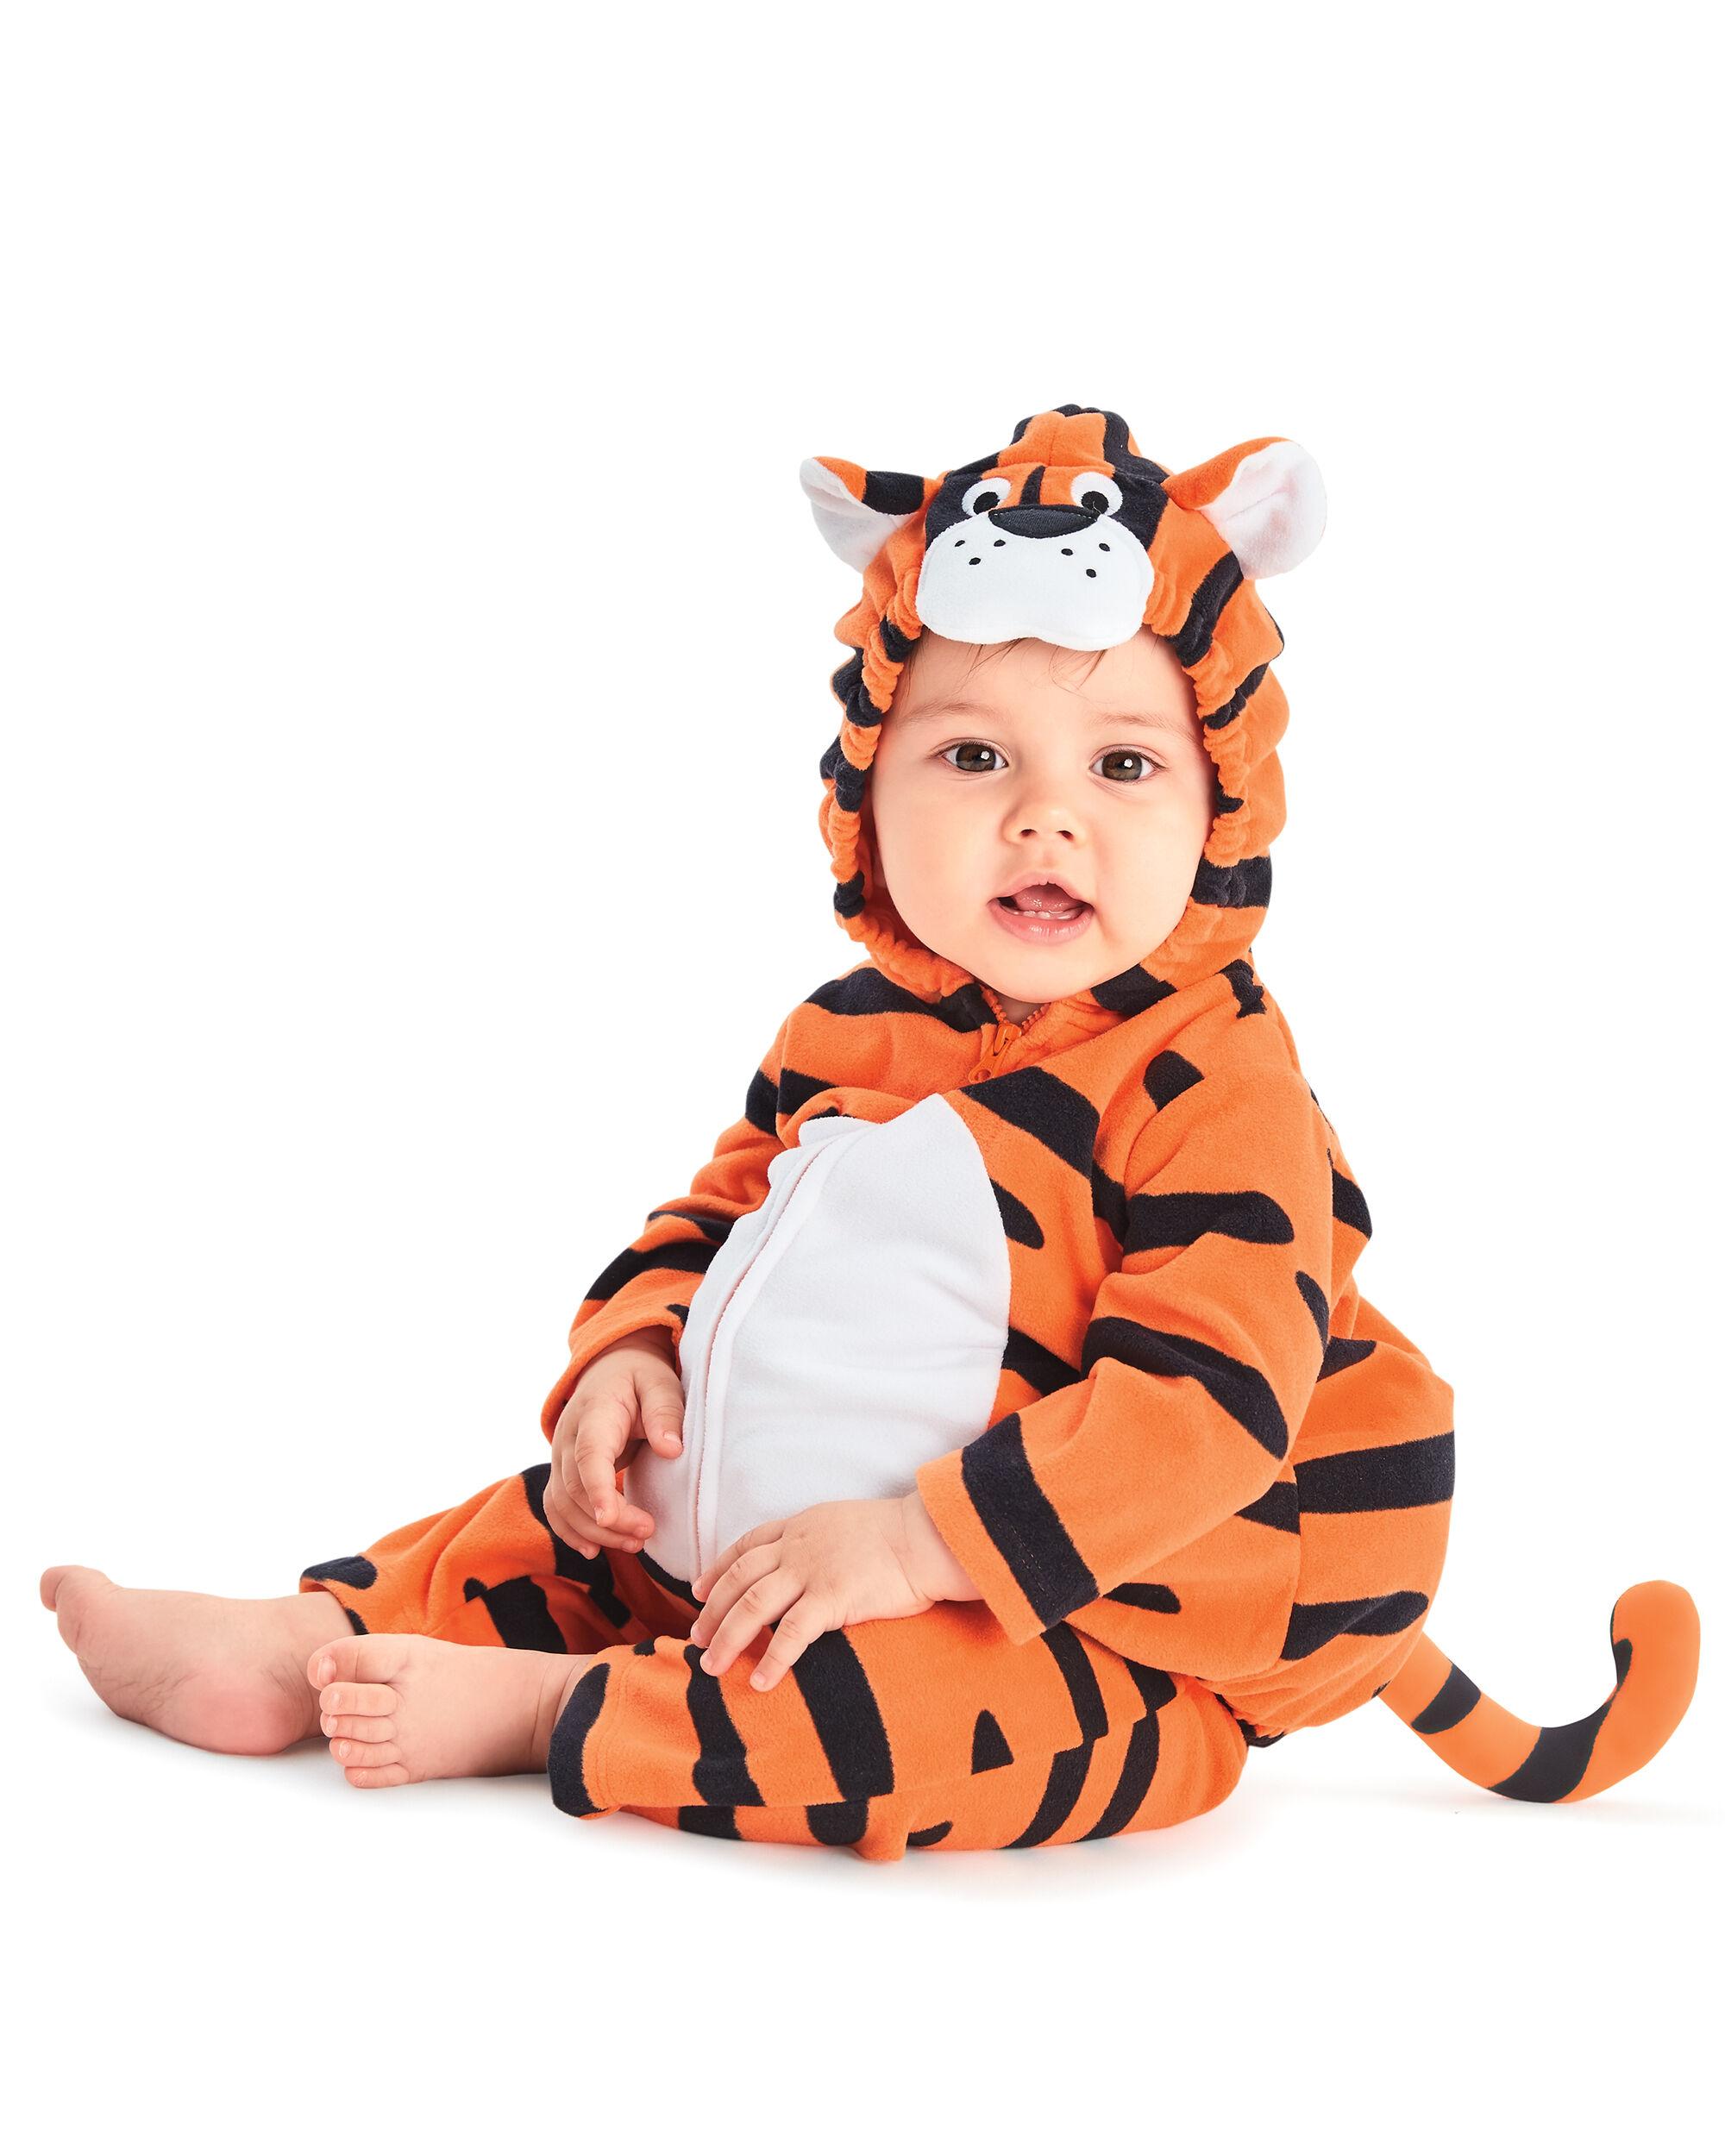 Little Tiger Halloween Costume ...  sc 1 st  Carteru0027s & Little Tiger Halloween Costume | Carters.com